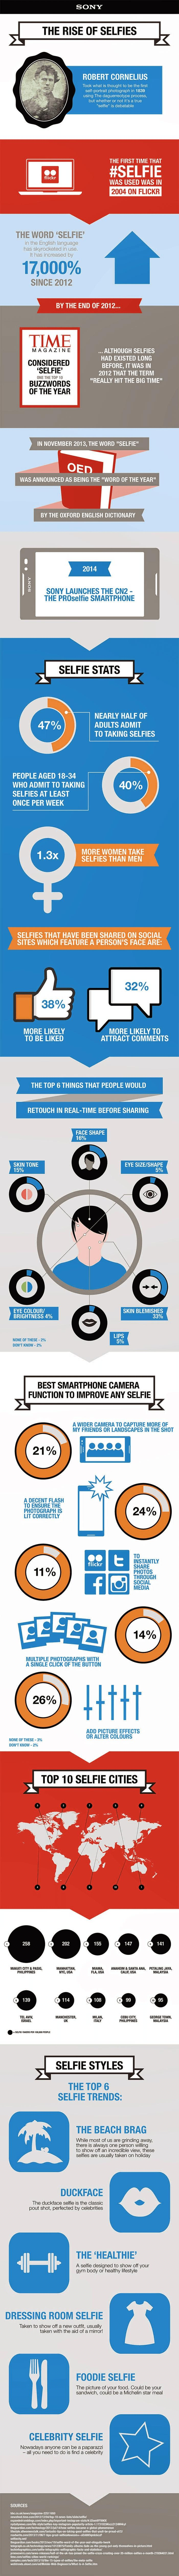 Sony Xperia Selfie smartphone infographic